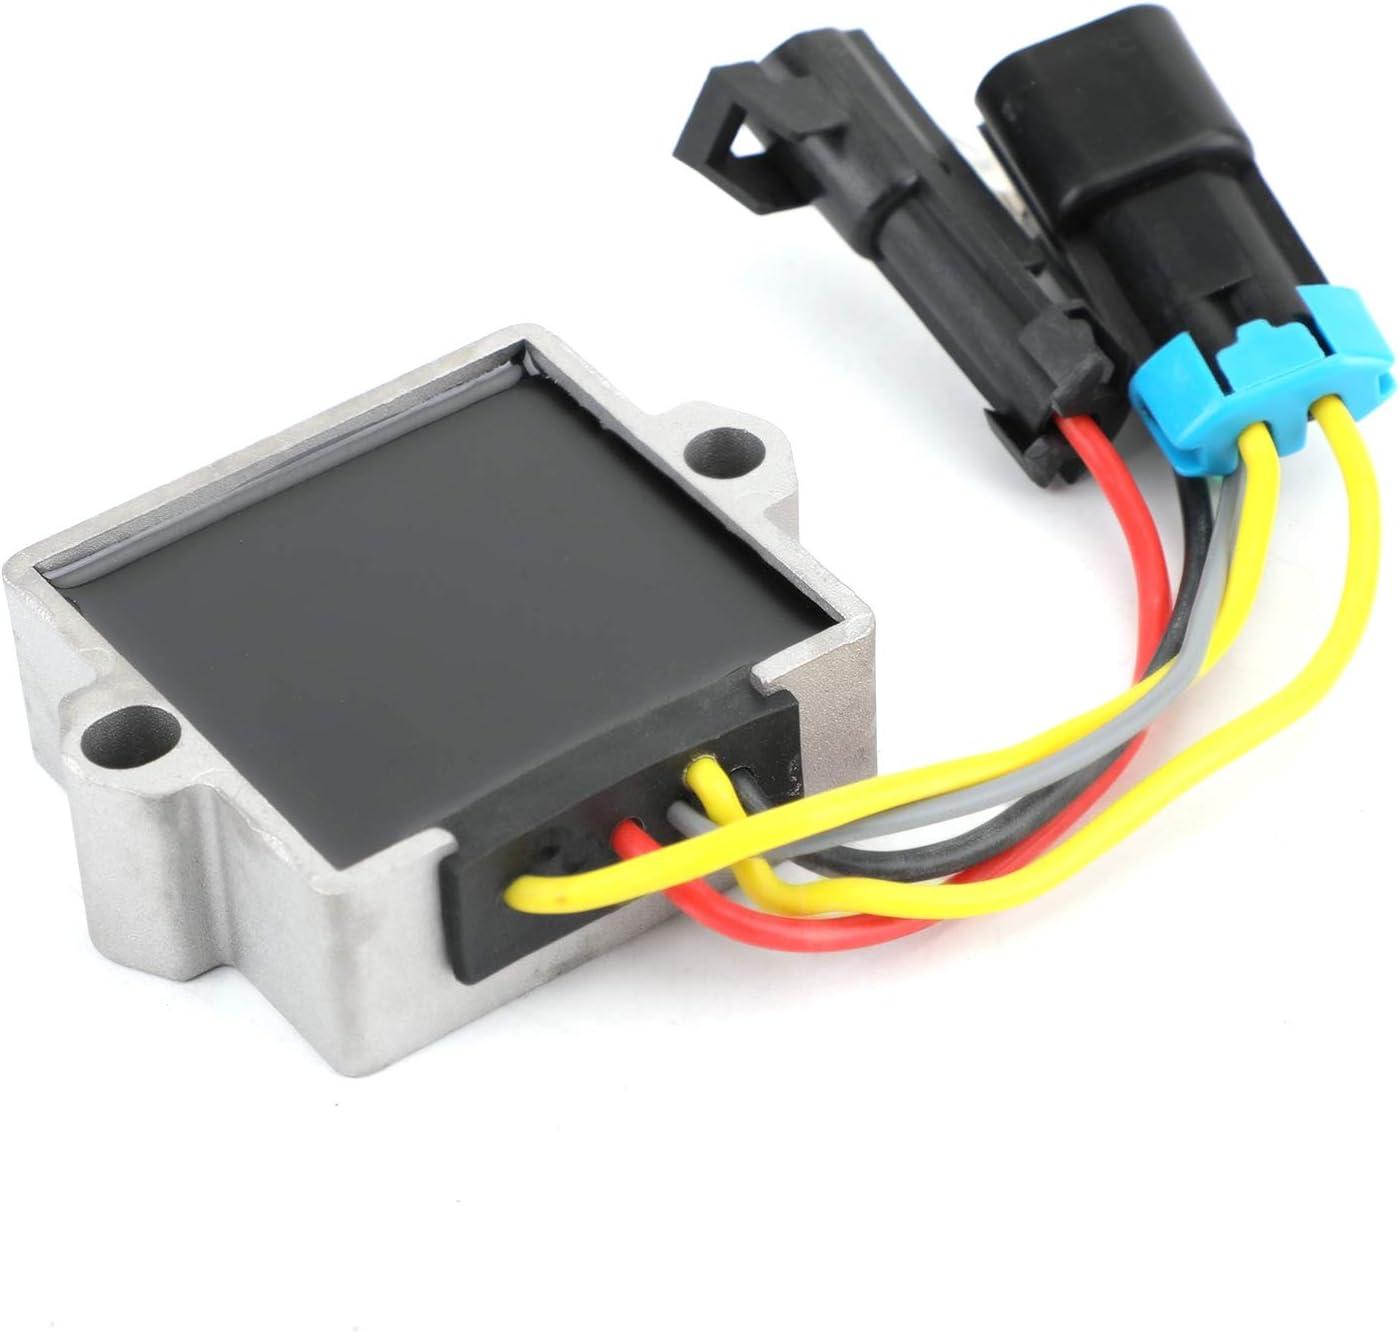 Bruce /& Shark Voltage Regulator for Mercury Mercruiser F25 F30 F40 F50 F60 854514T1 883071T1